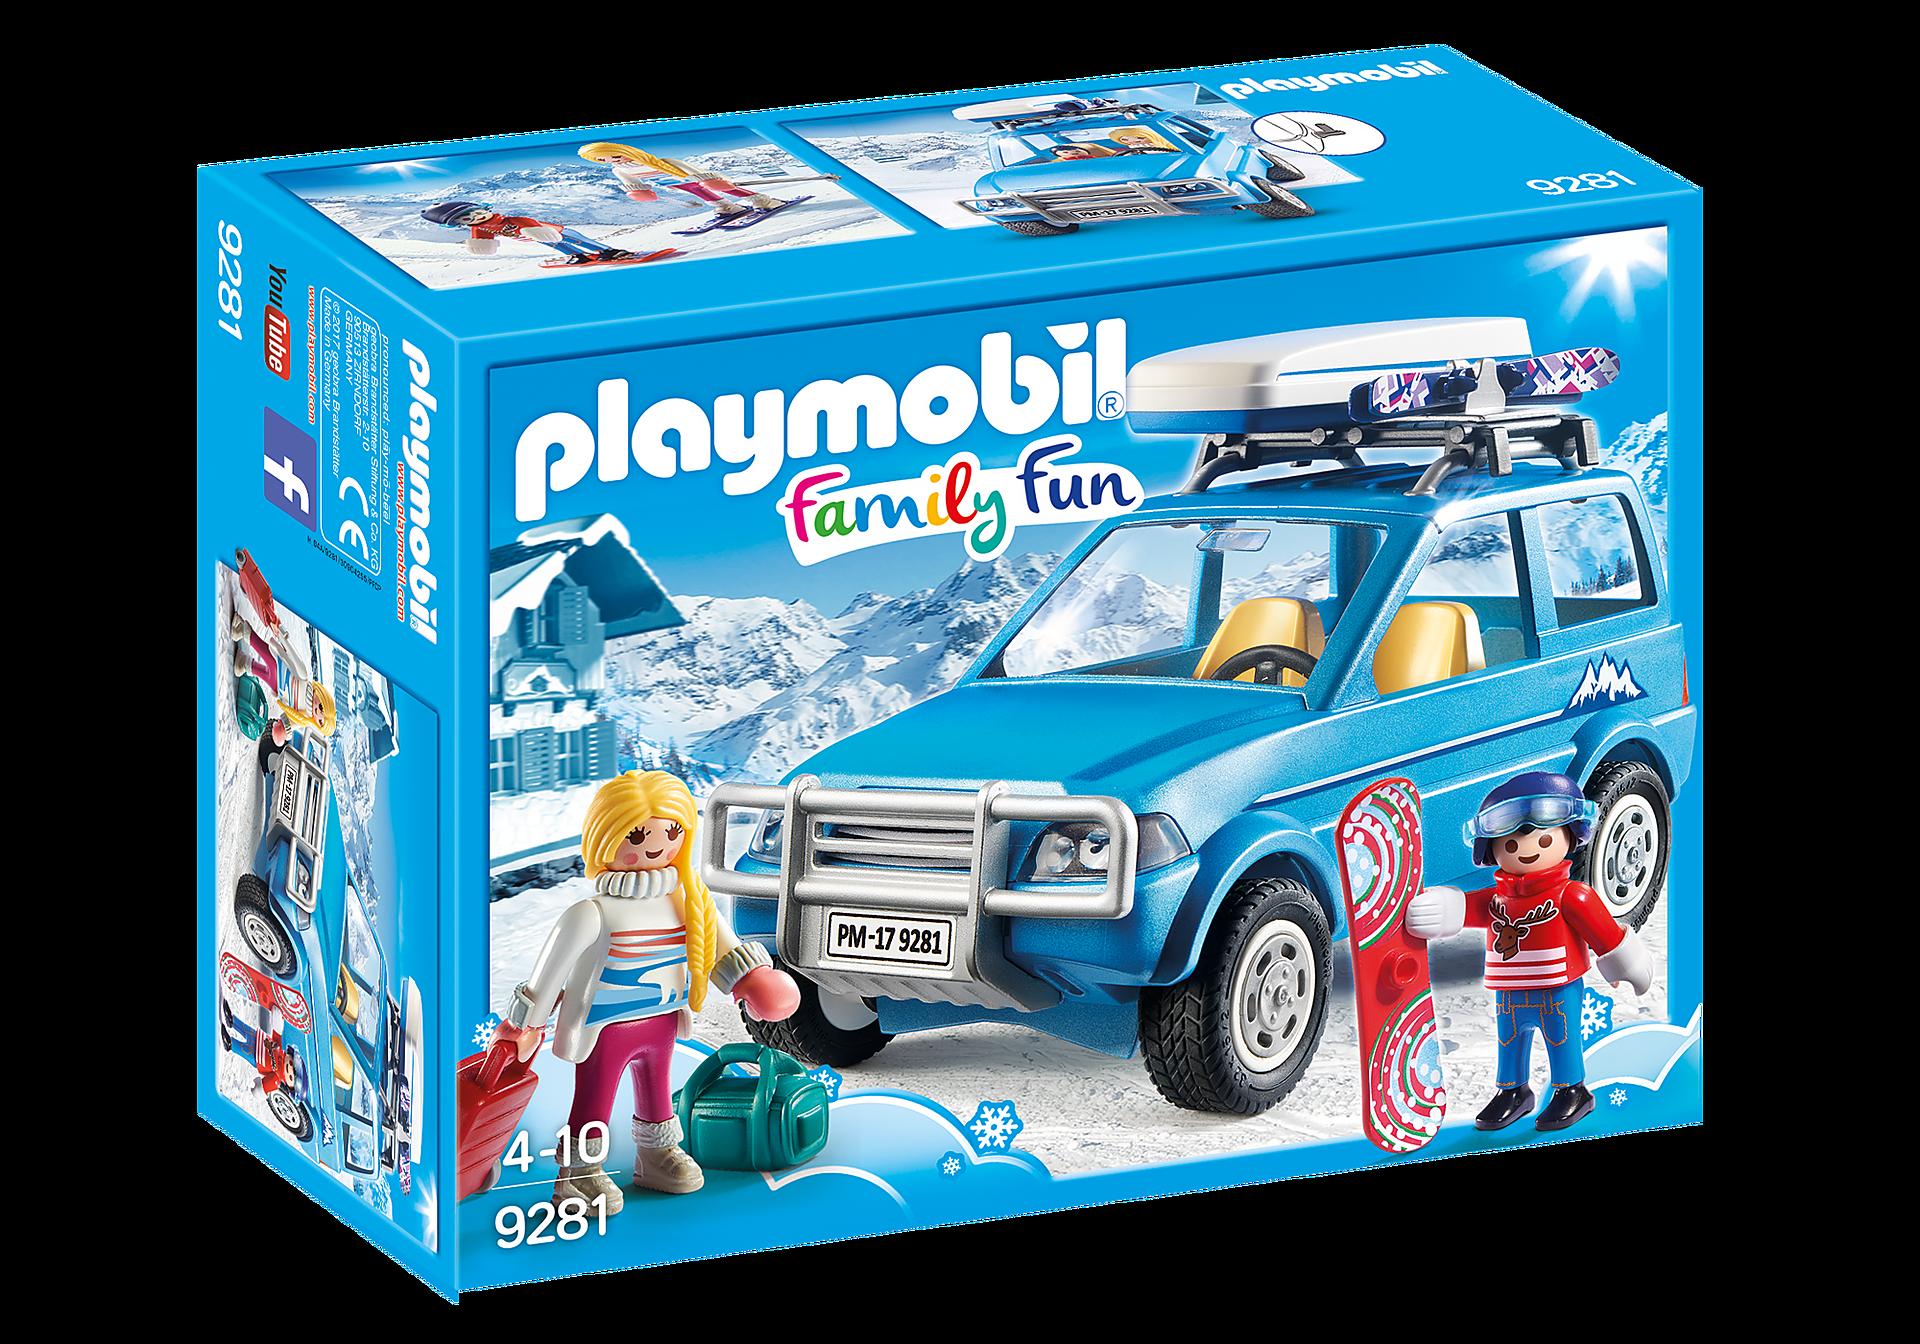 http://media.playmobil.com/i/playmobil/9281_product_box_front/Όχημα 4x4 με μπαγκαζιέρα